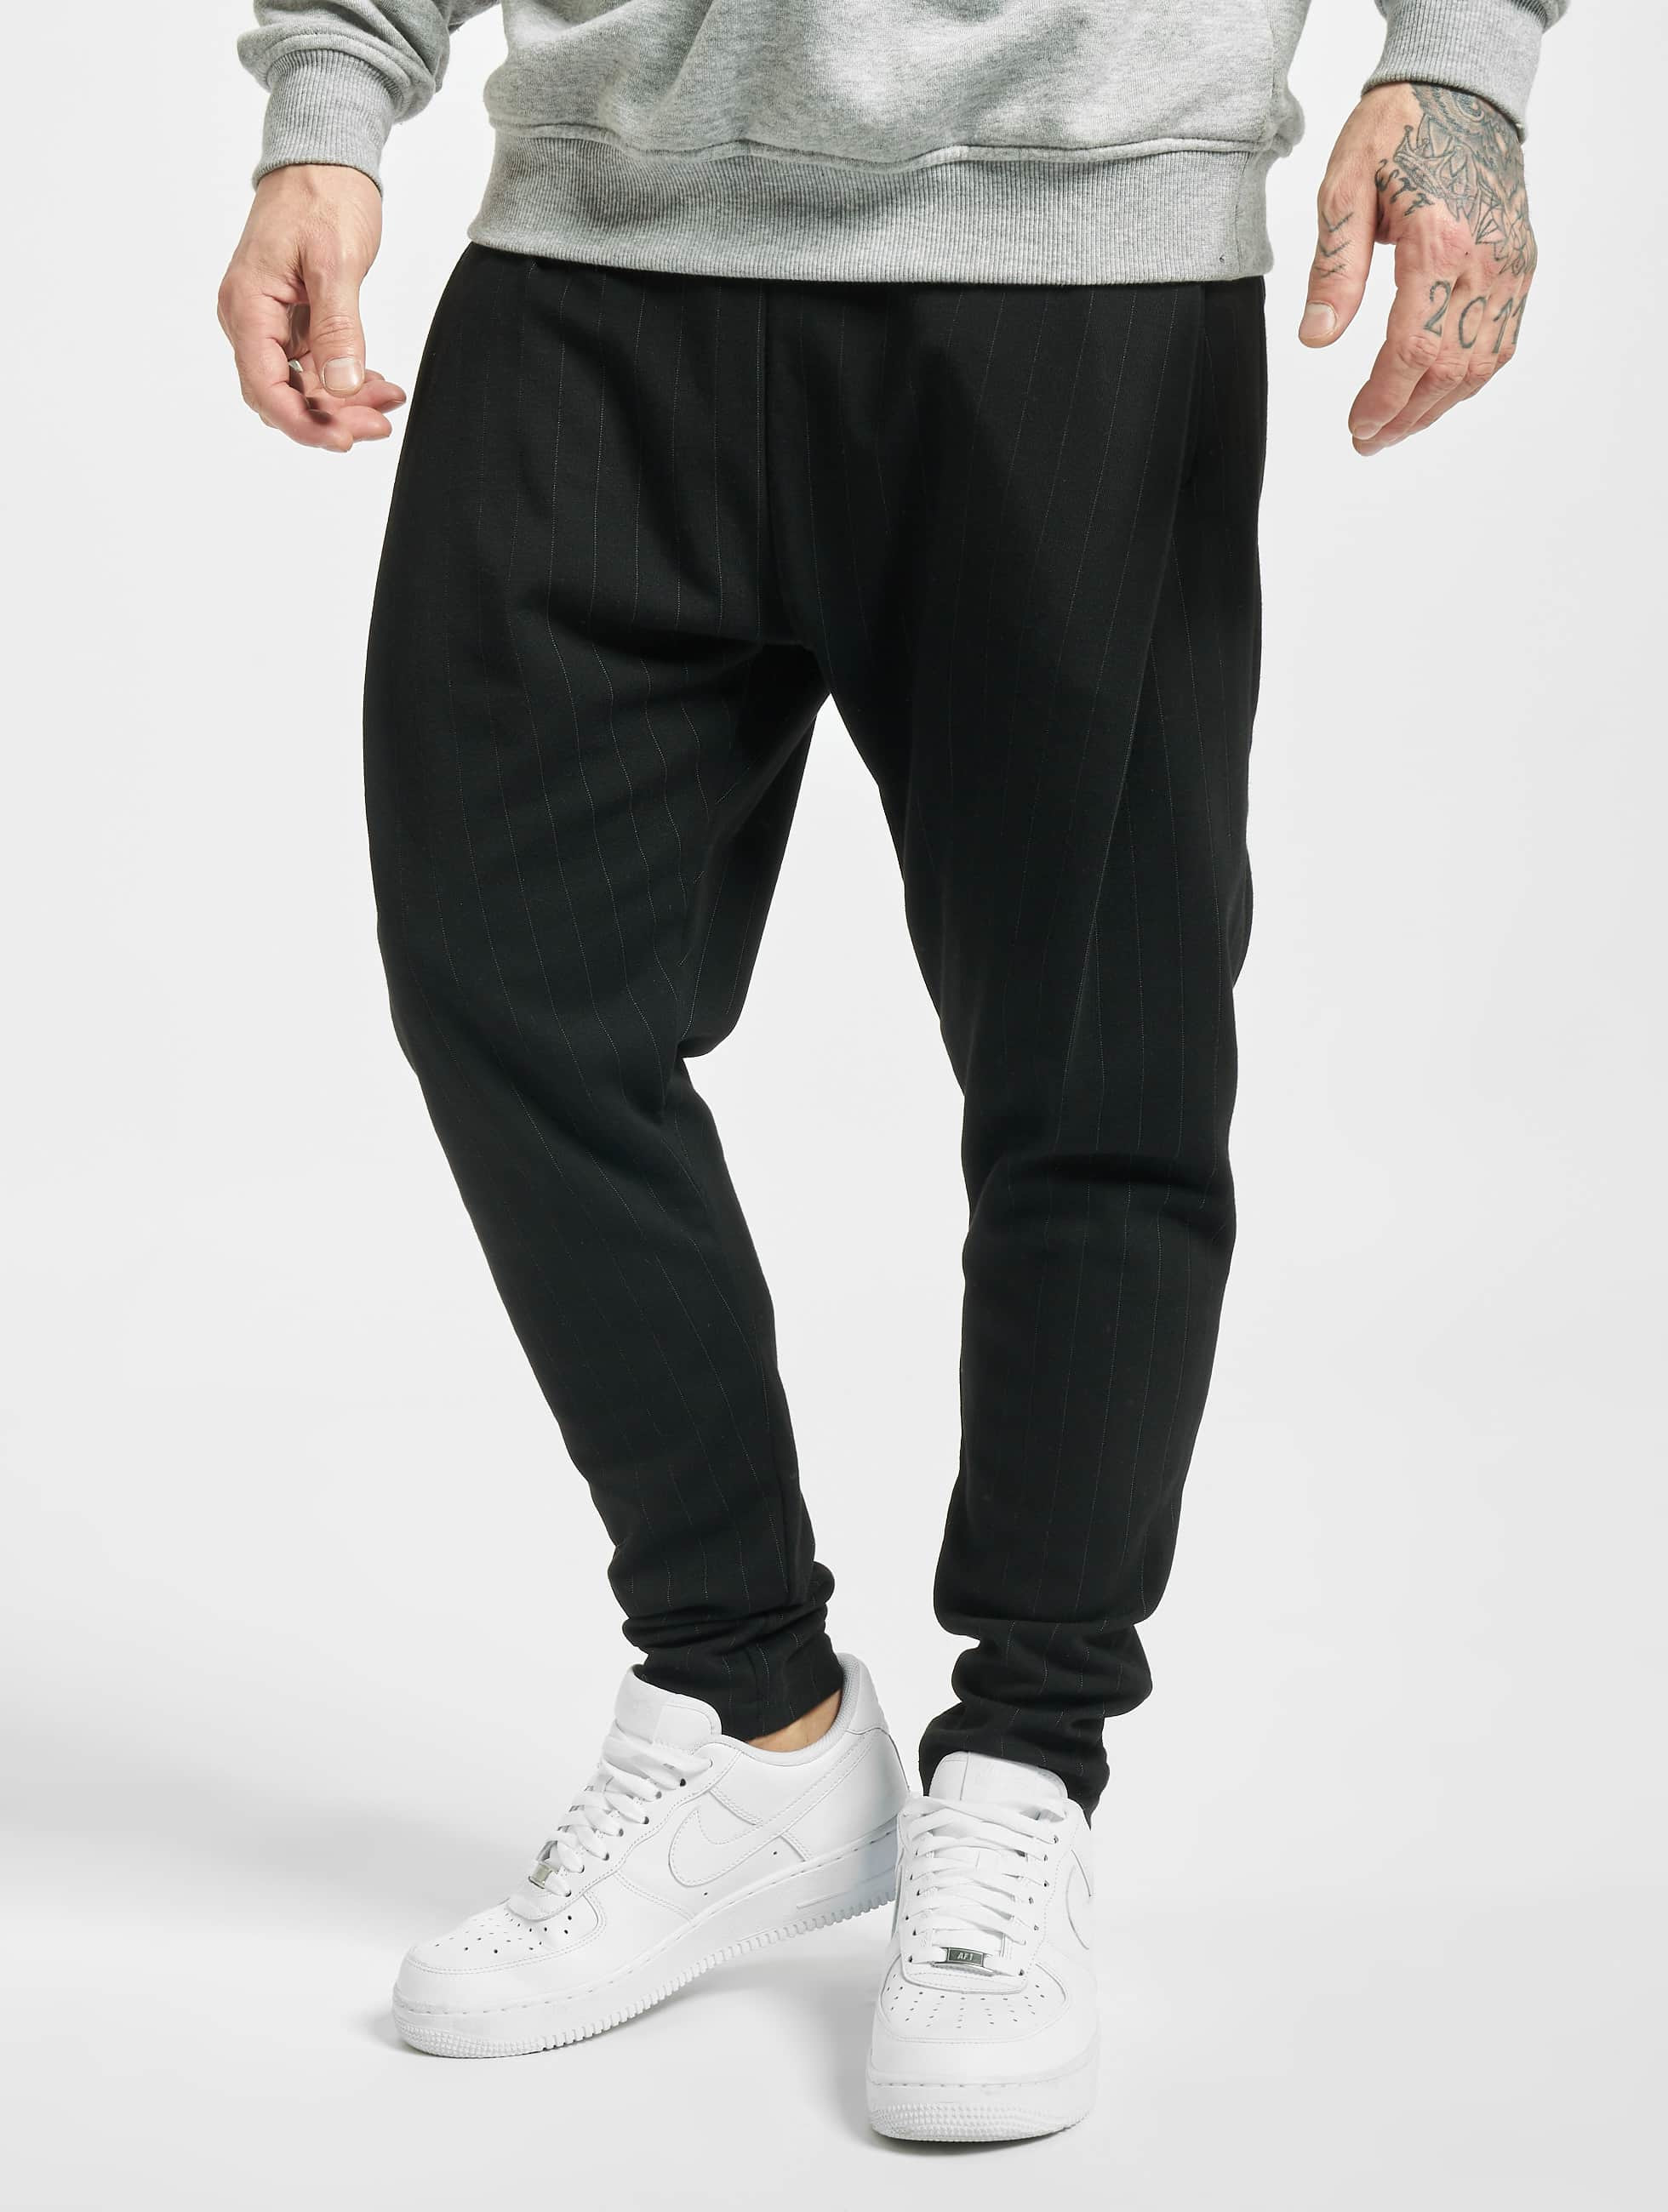 2Y / Sweat Pant Akif in black XL